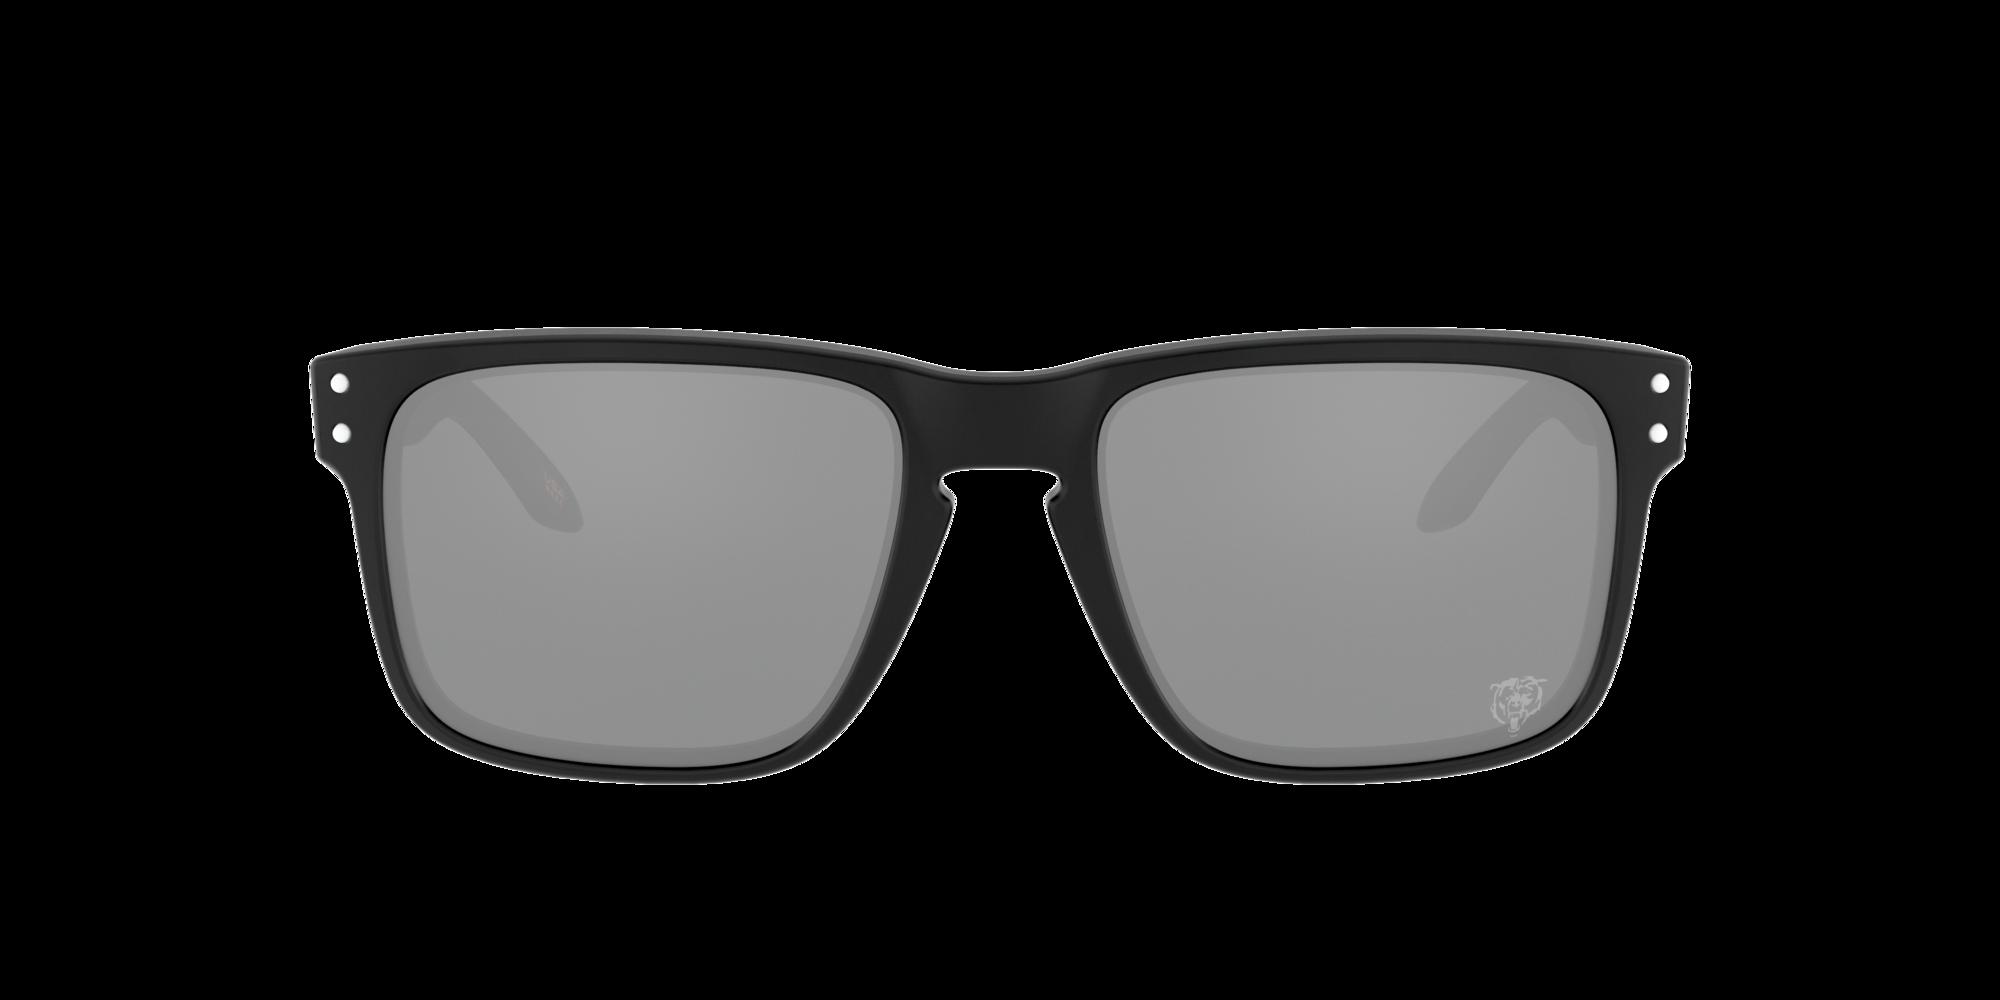 Image de OO9102 55 HOLBROOK from LensCrafters | Lunettes, lunettes d'ordonnance en ligne, lunetterie